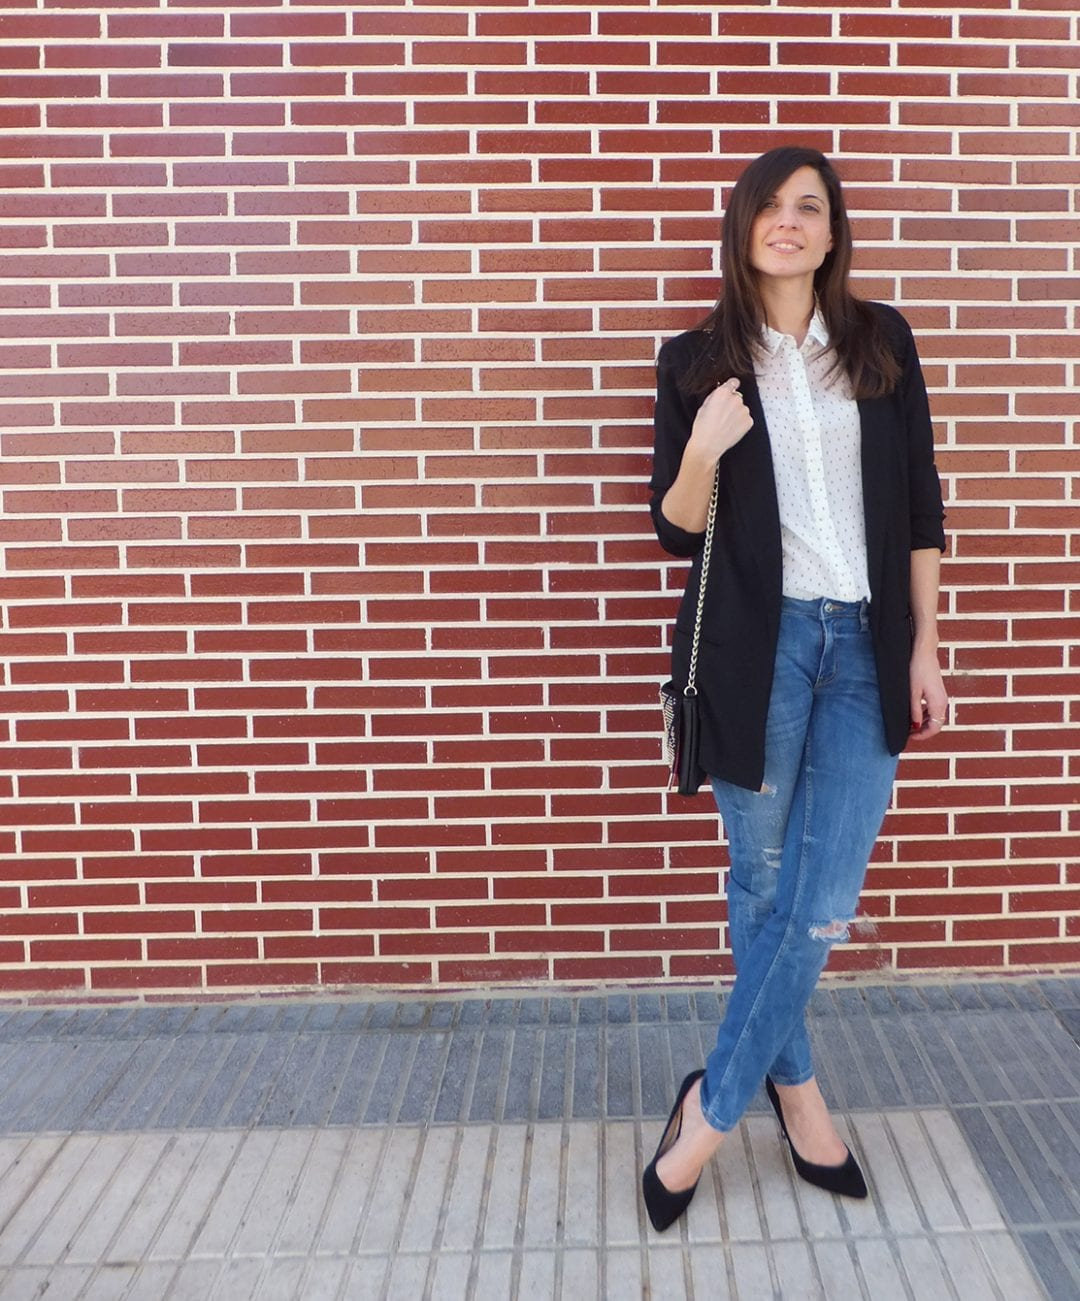 combinar blusa estampada y blazer larga - how to wear long blazer and print blouse - vespa - fashion blogger - bloguera de moda